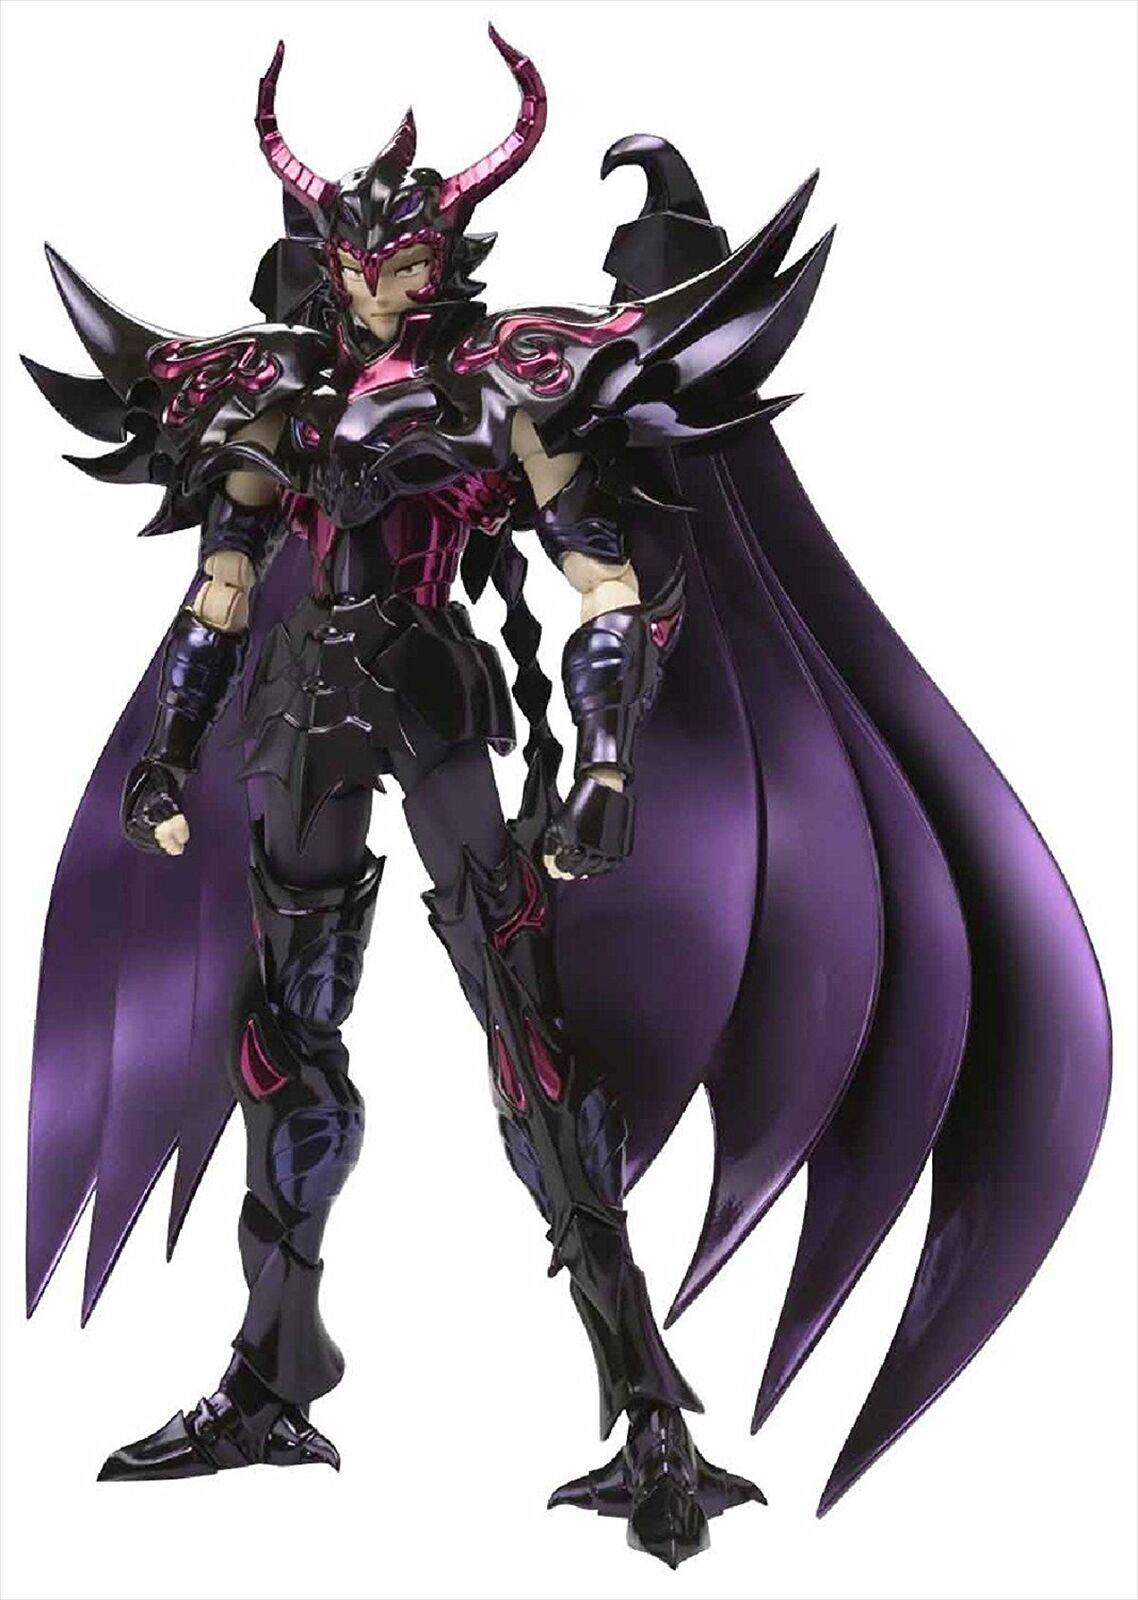 Bandai Saint Seiya Cloth Myth EX Wyvern Radamanthys Action Figure